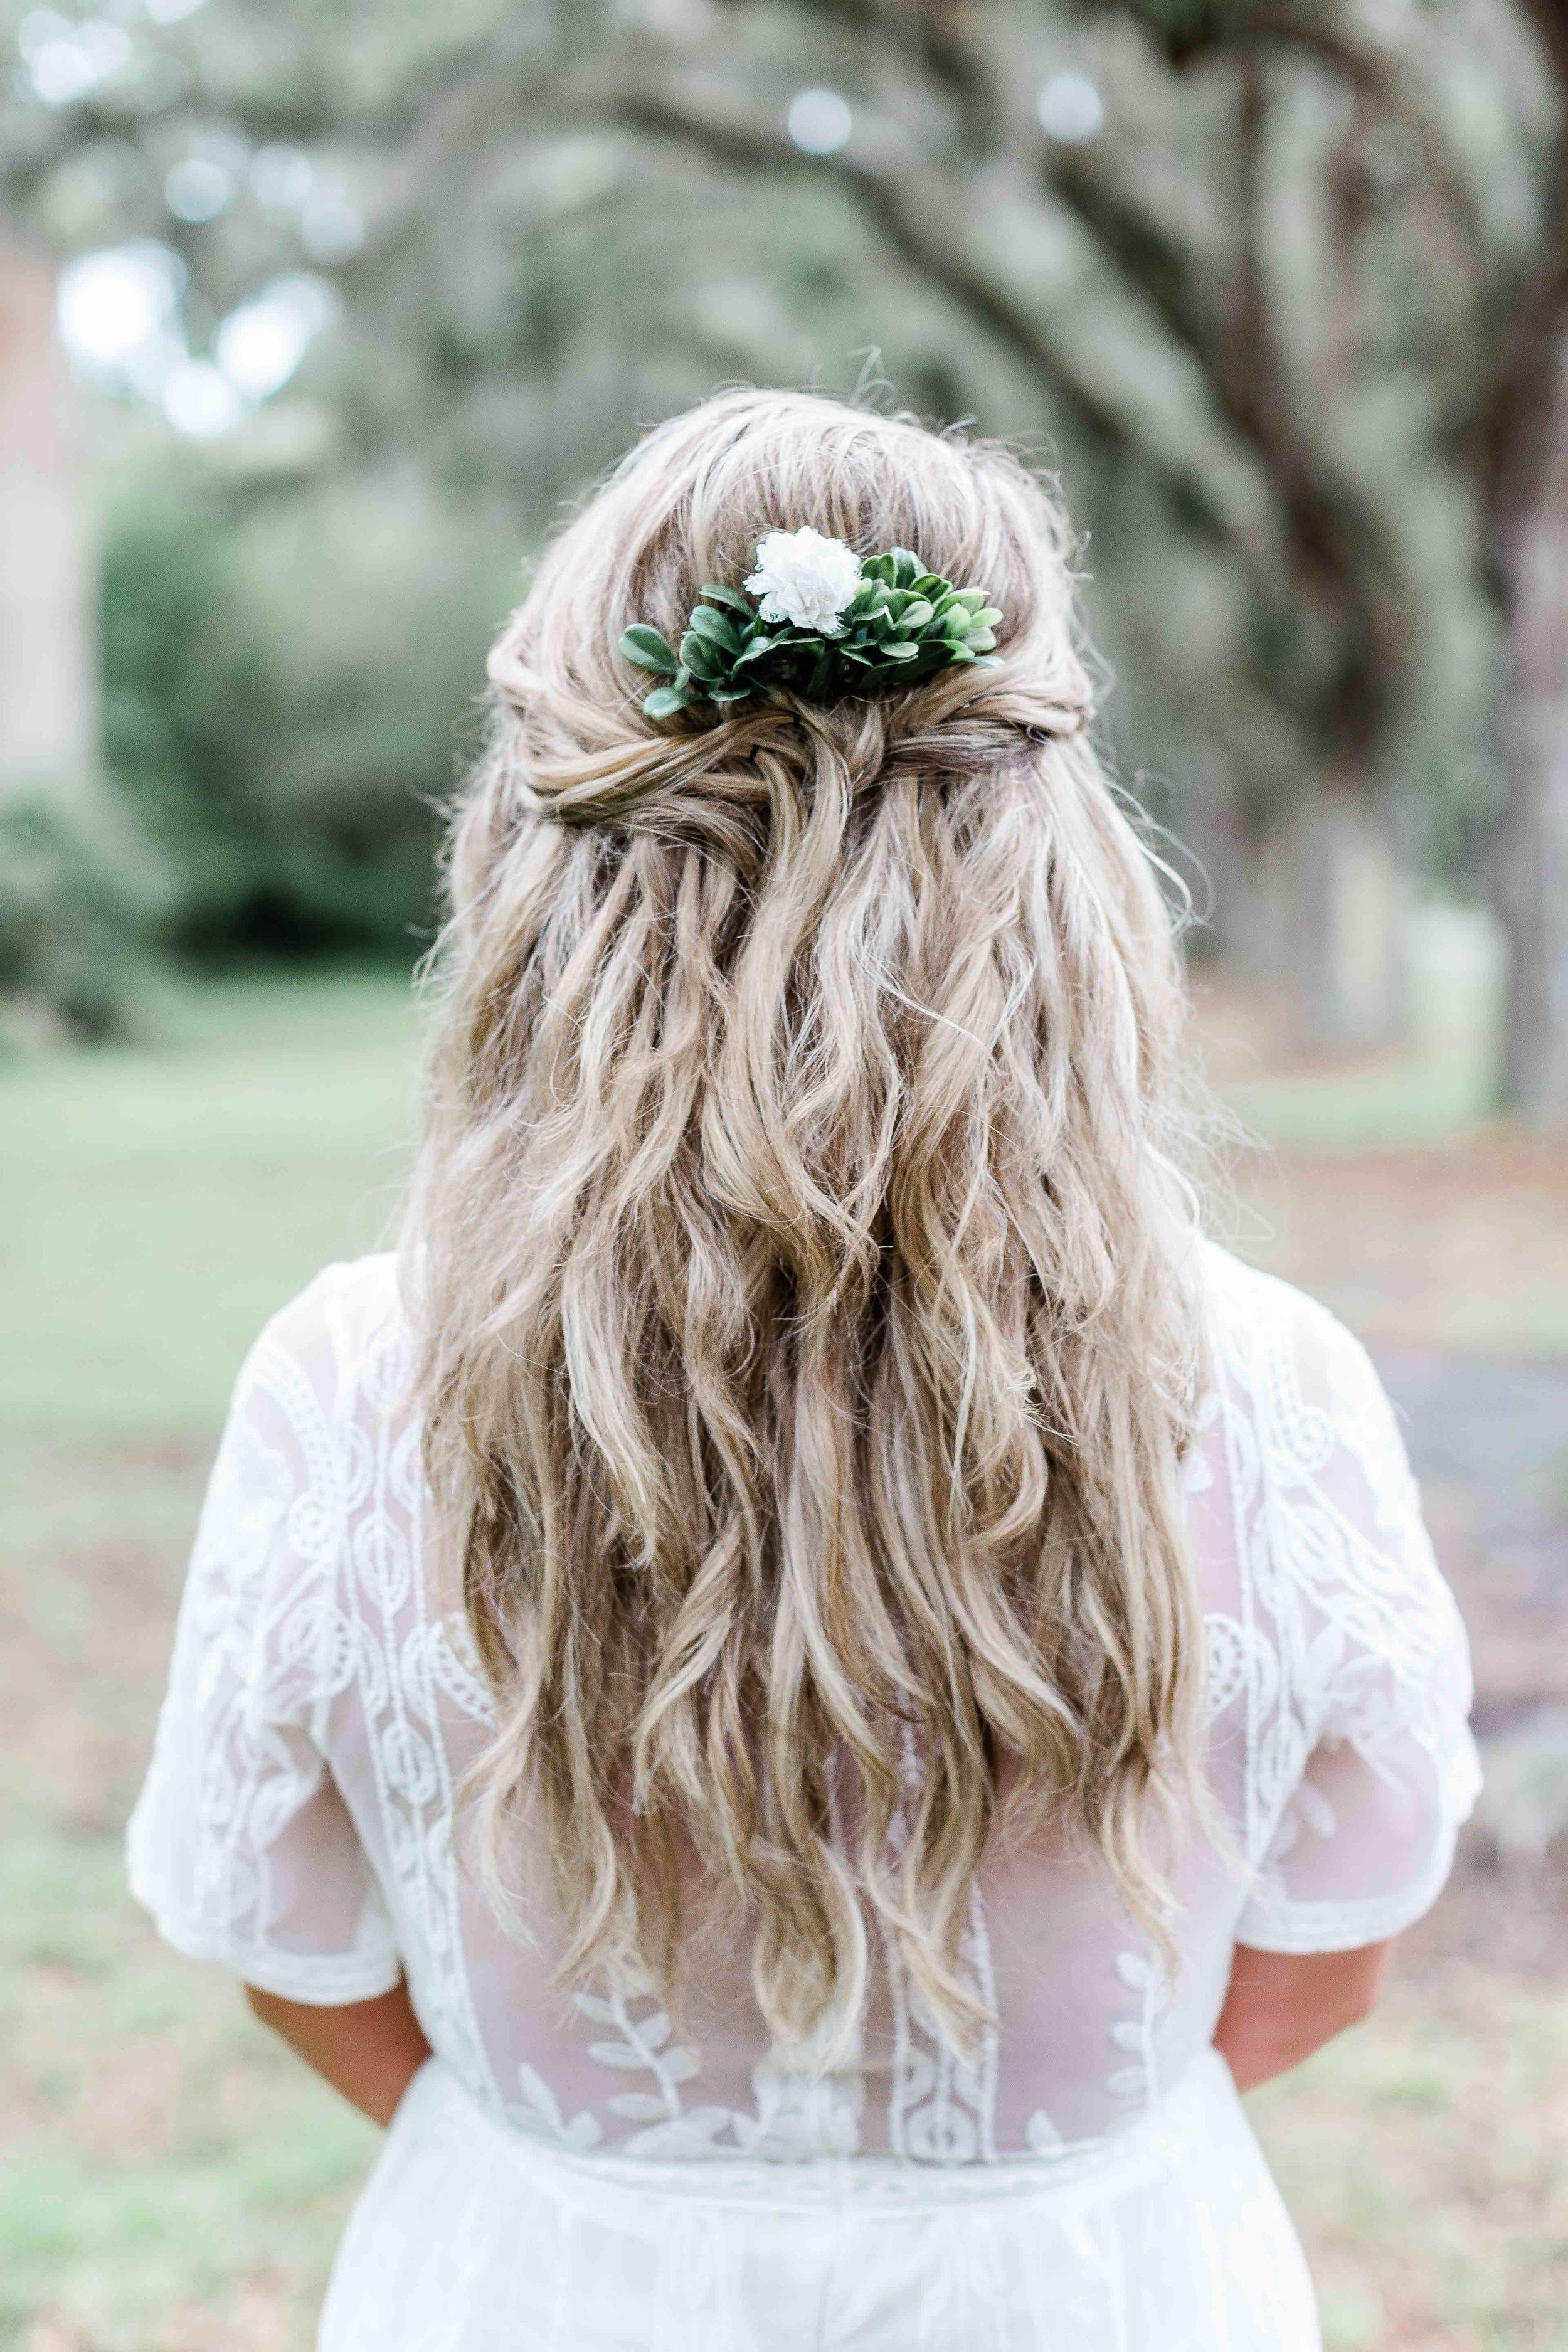 20190727Georgia-Wormlsoe Plantation-Simply Eloped-Savannah Wedding Photographer- Southern Lens Photography33.jpg